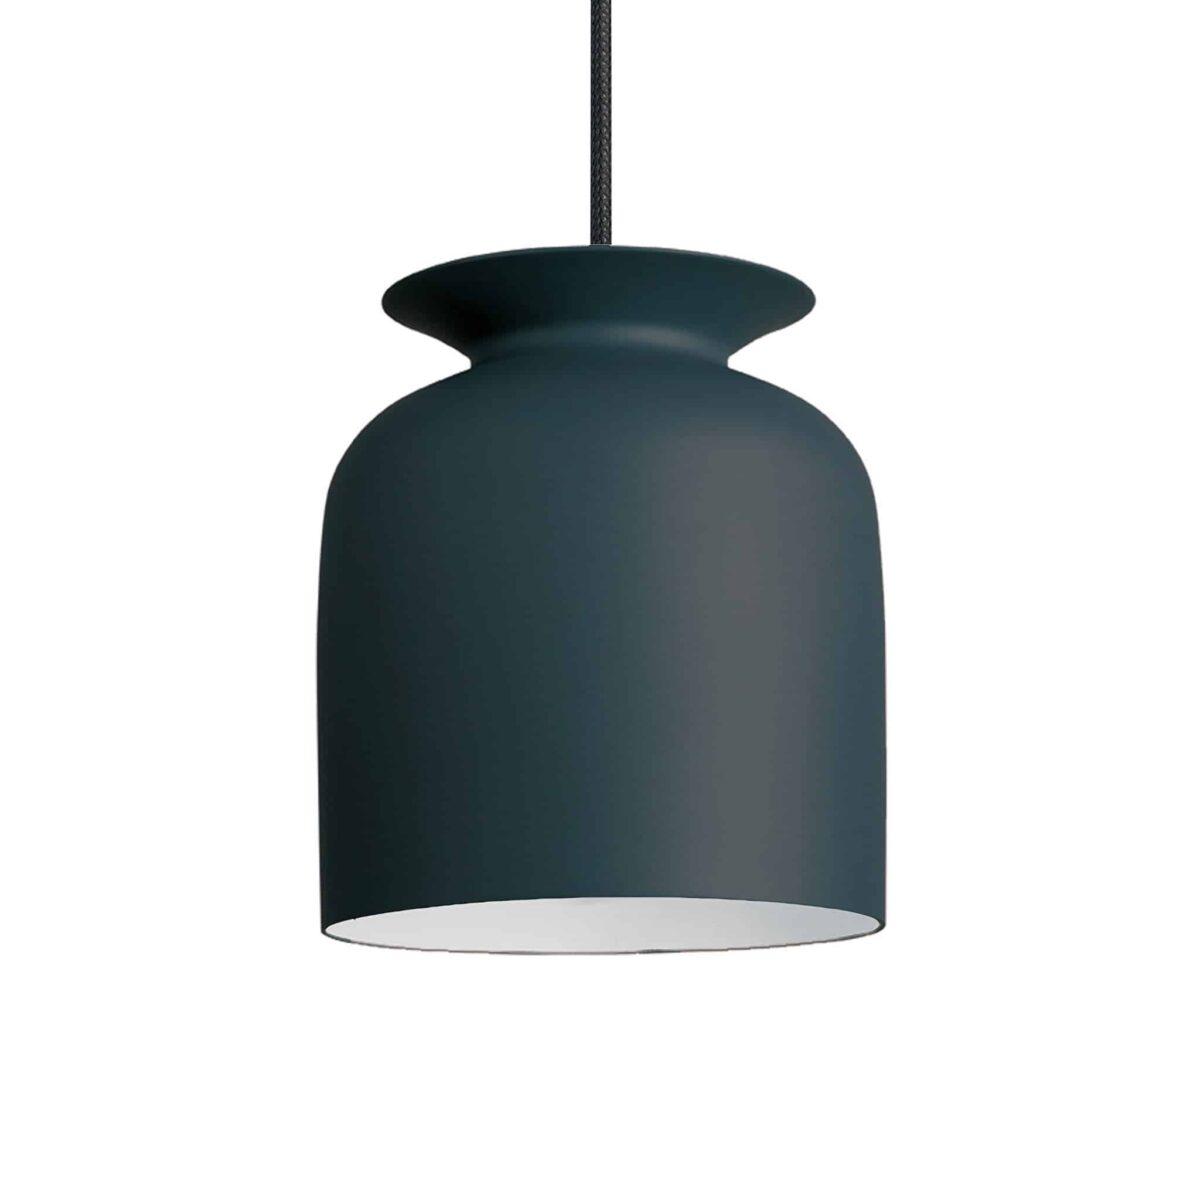 gubi-ronde-pendant-anthracite-grey-001